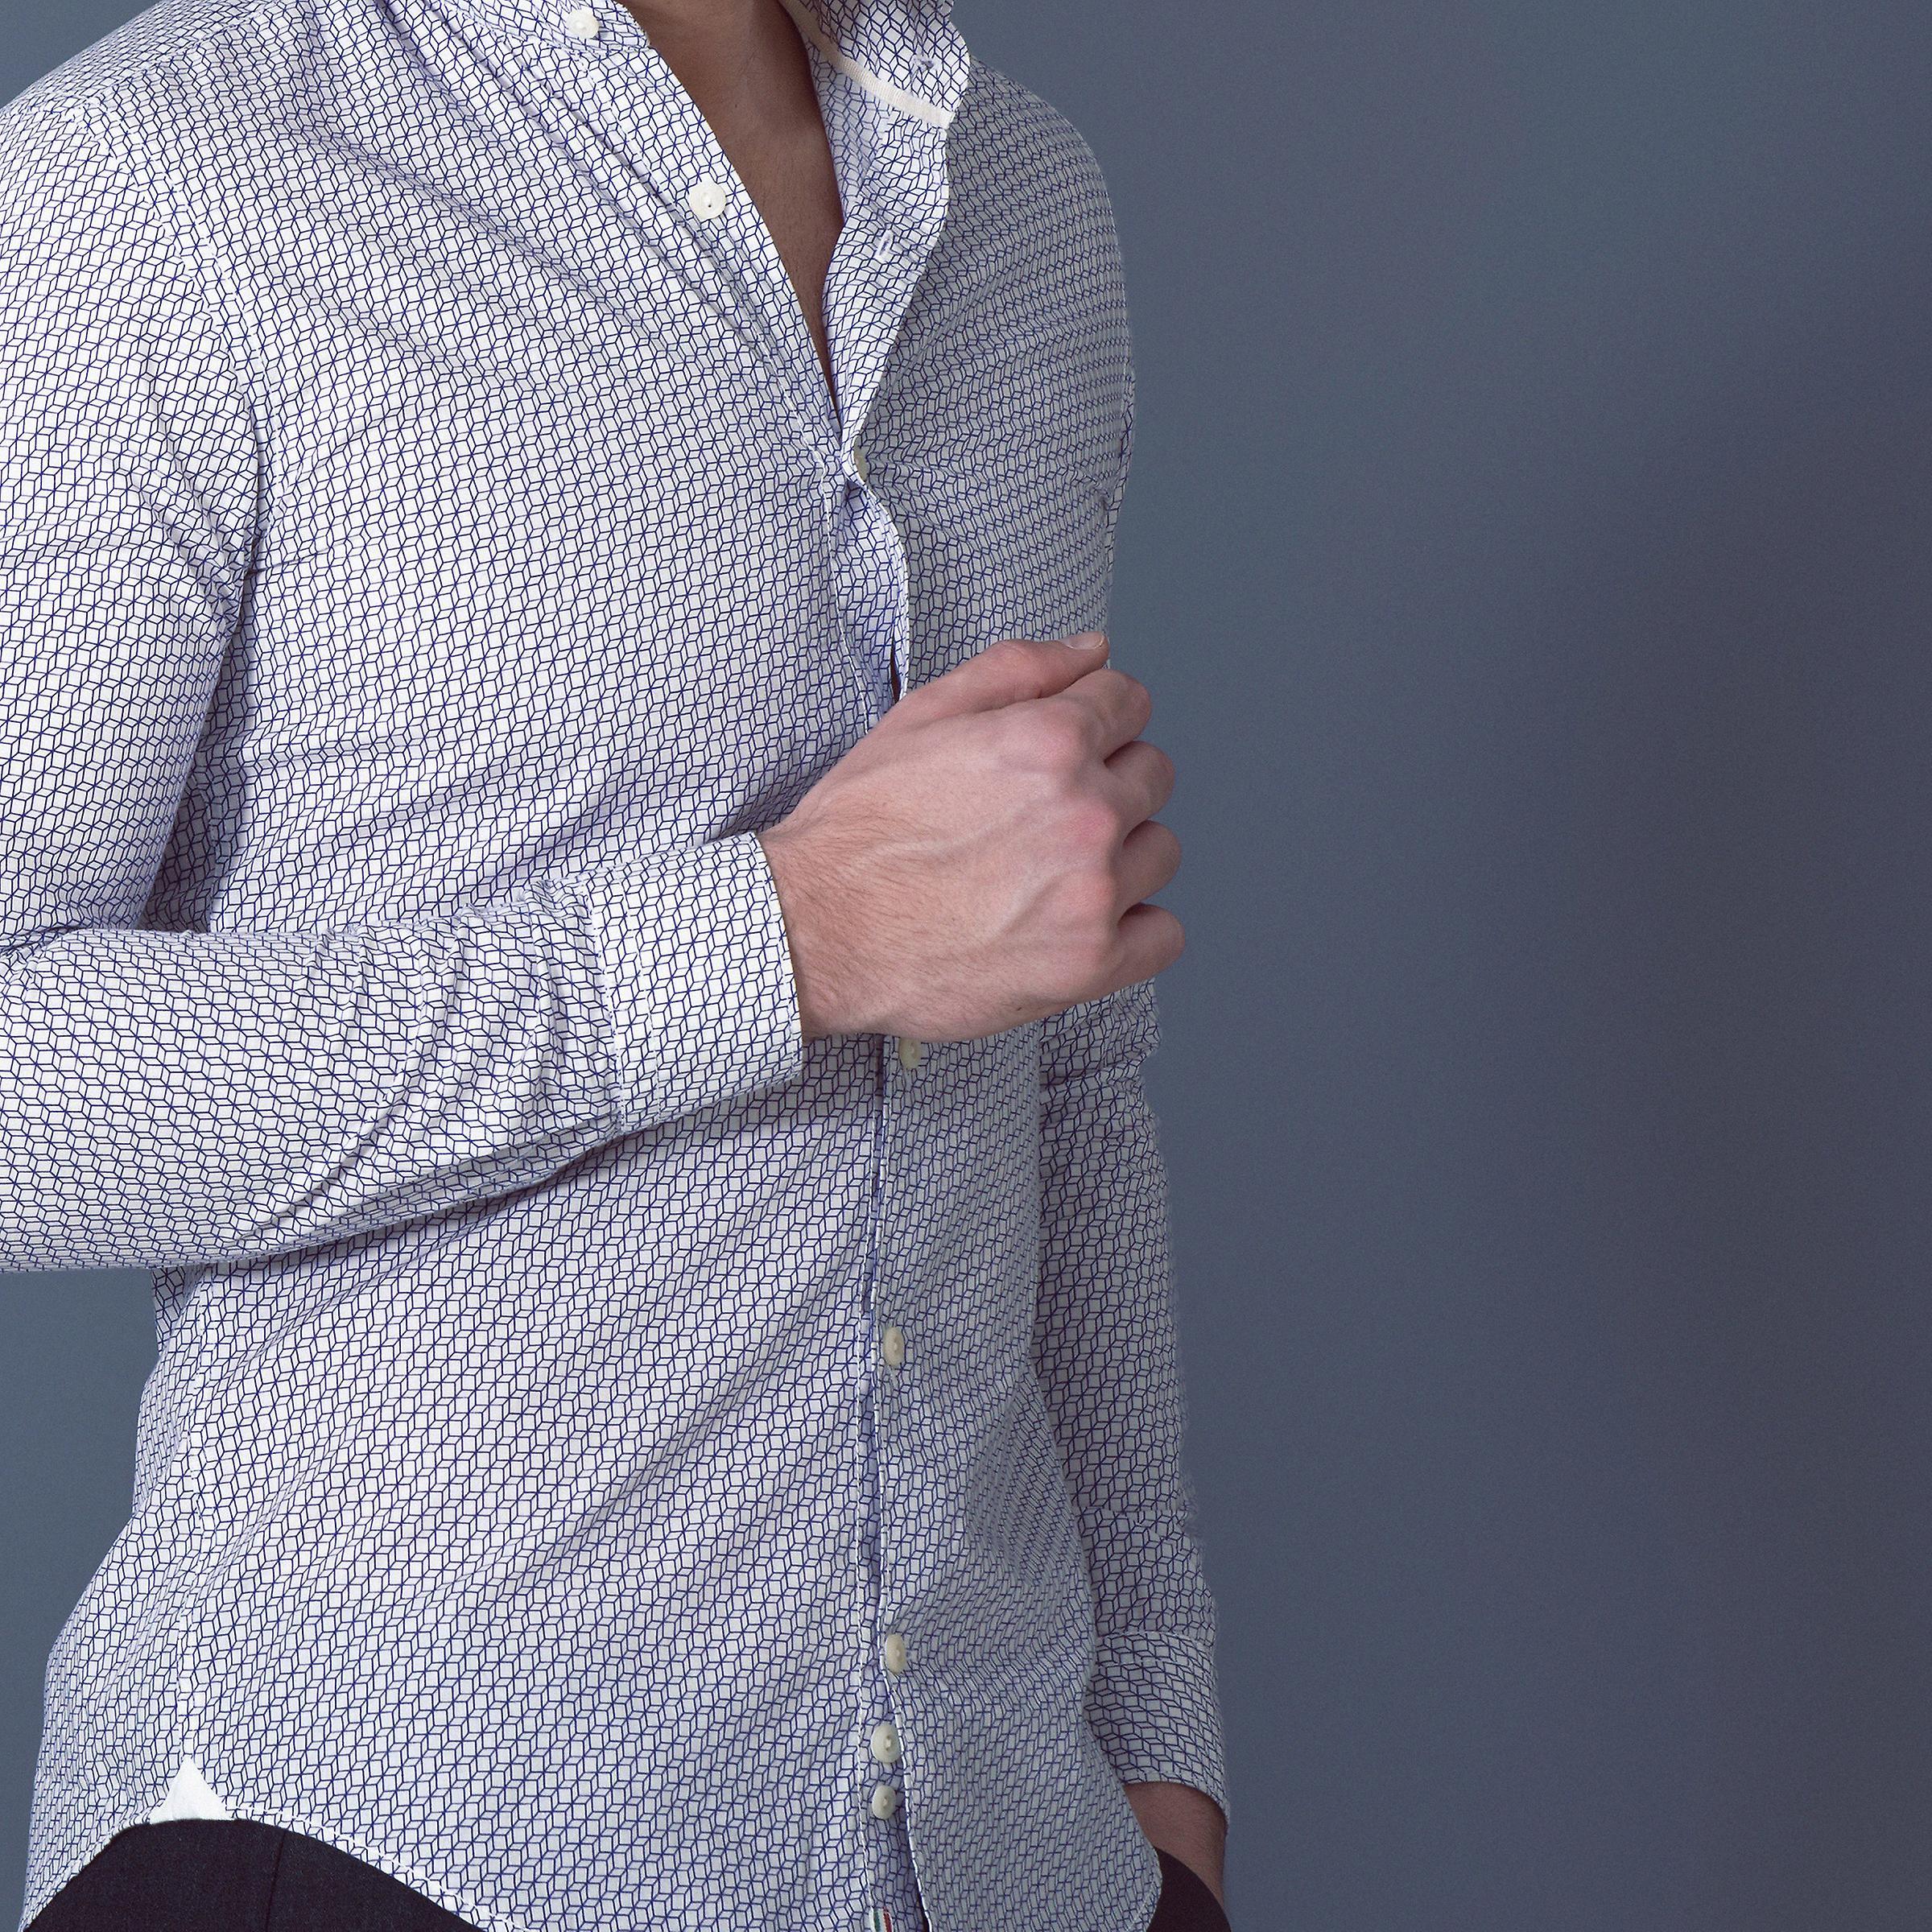 Fabio Giovanni Alberona Shirt - Lightweight Italian Poplin Cotton Printed with 3-D Cube Pattern